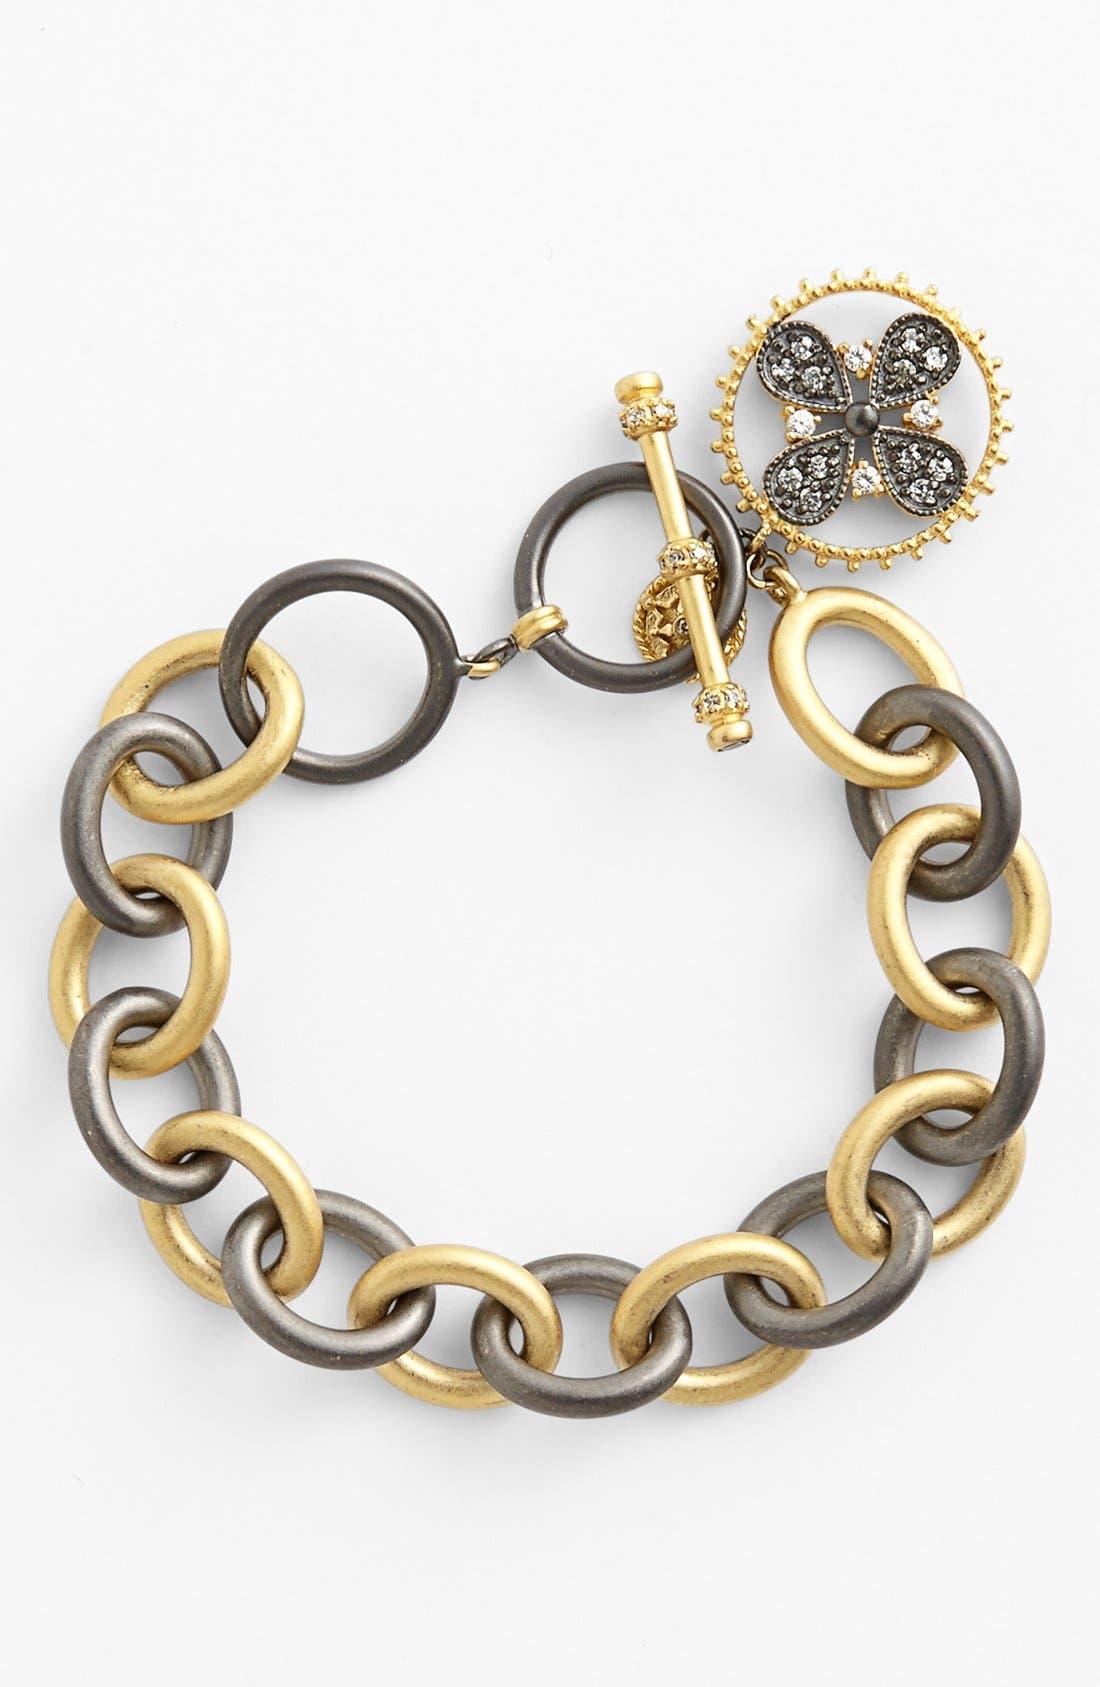 Main Image - FREIDA ROTHMAN 'Hamptons' Clover Charm Toggle Bracelet